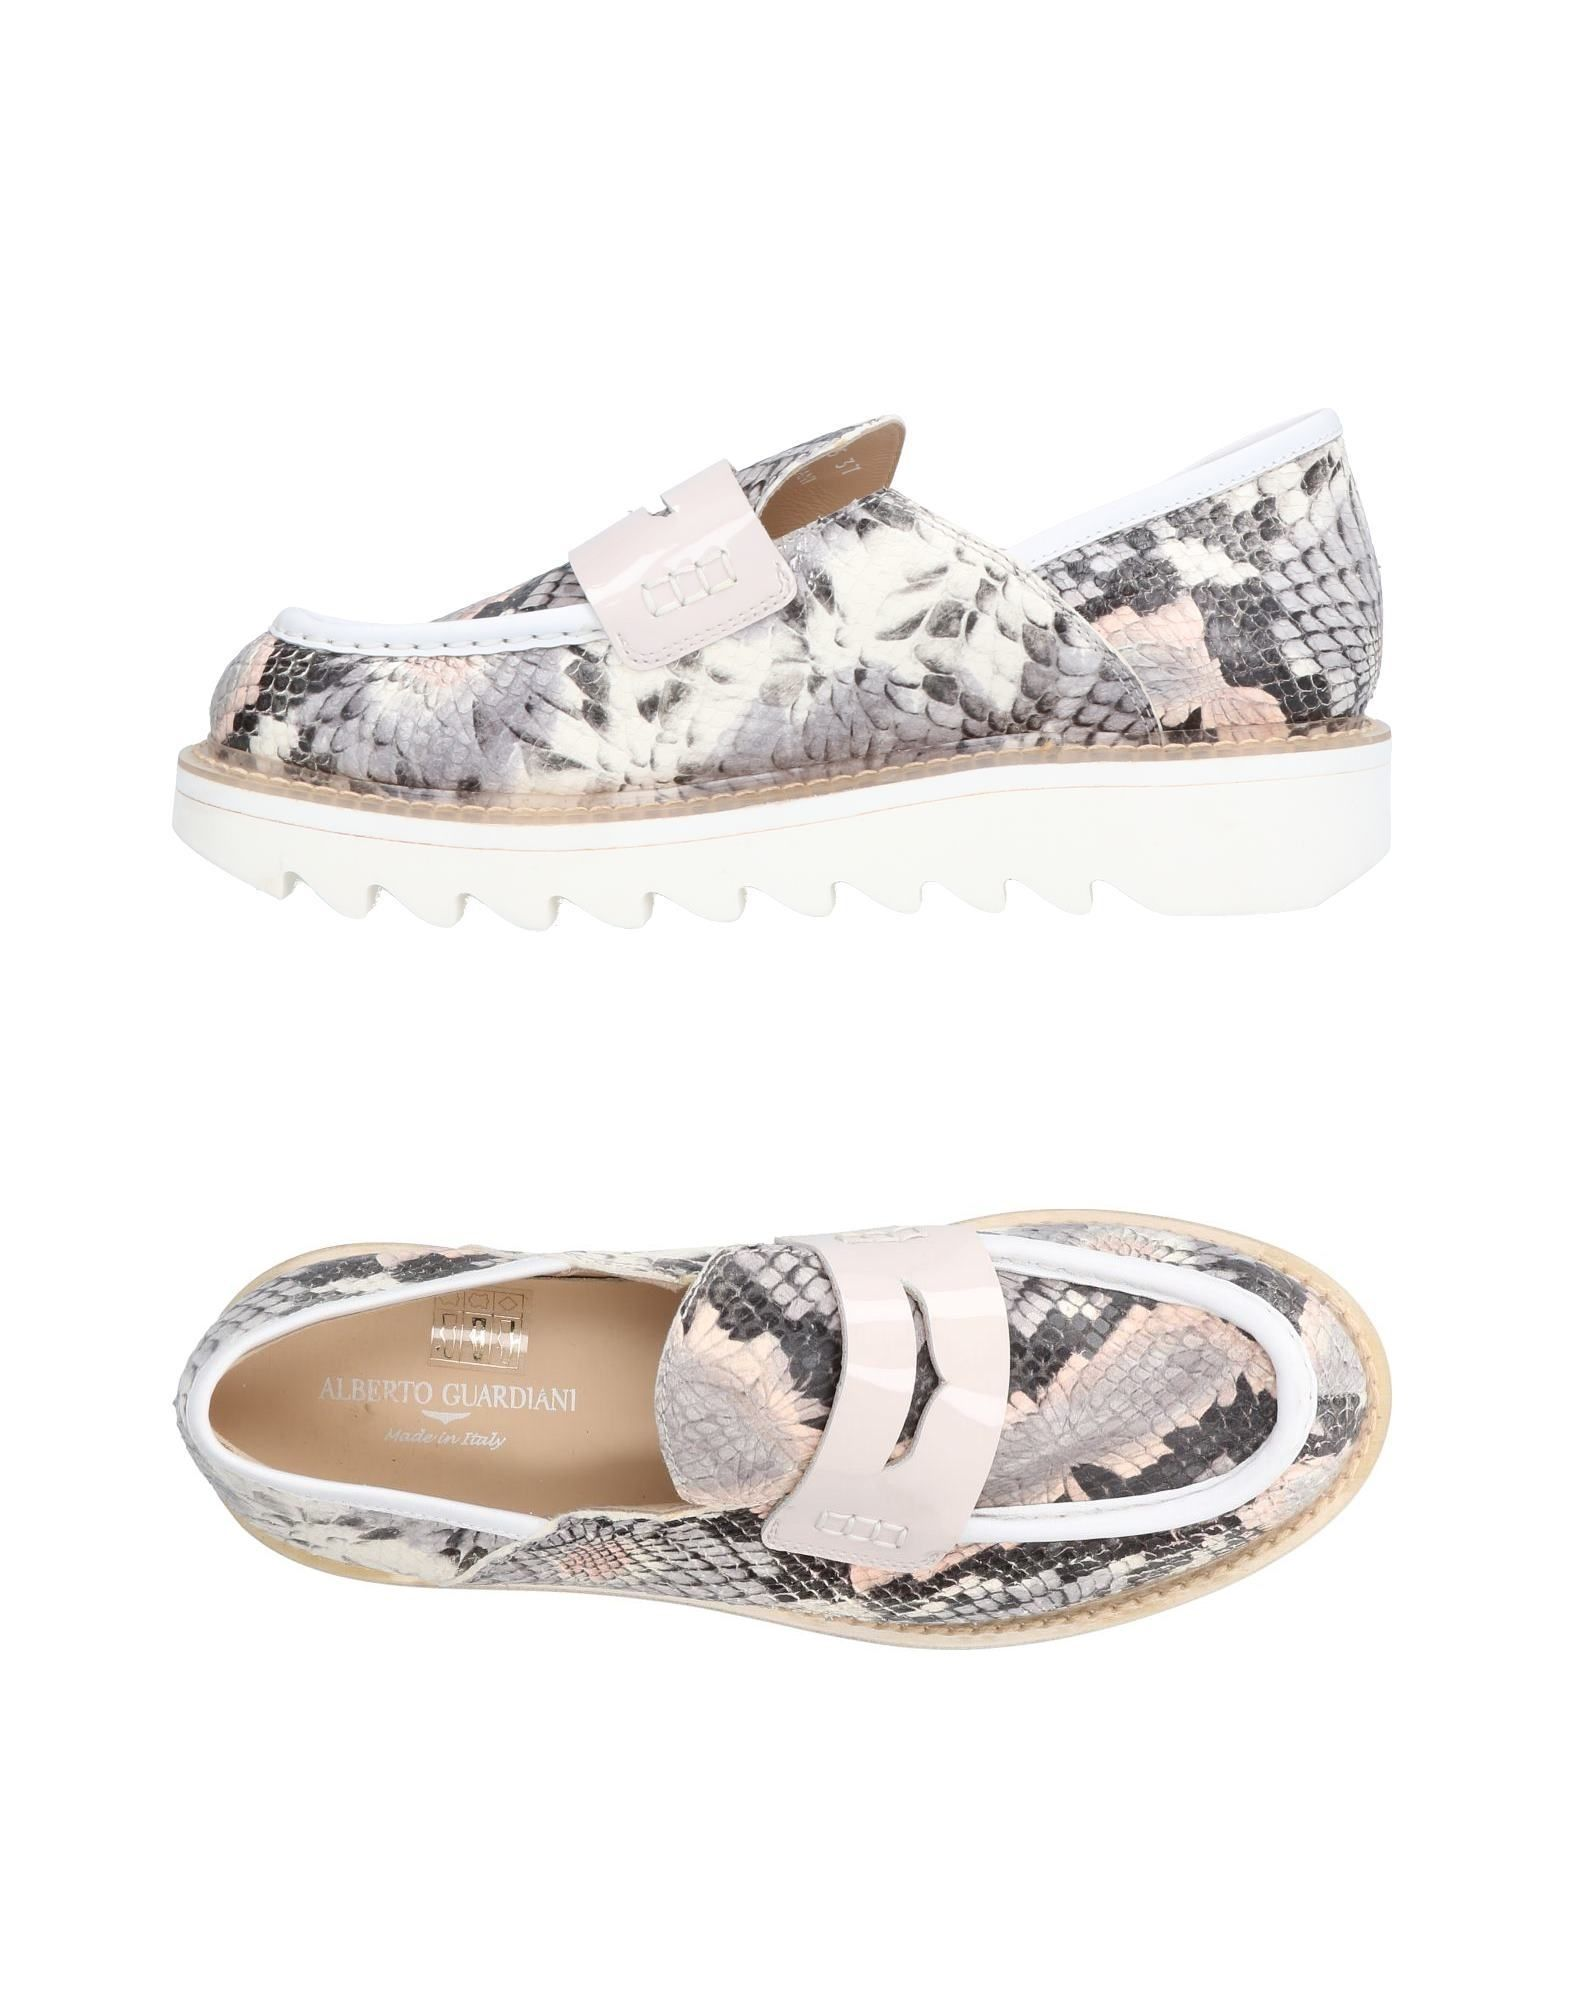 Sneakers Nuove Fitflop Donna - 11349312IS Nuove Sneakers offerte e scarpe comode e16634